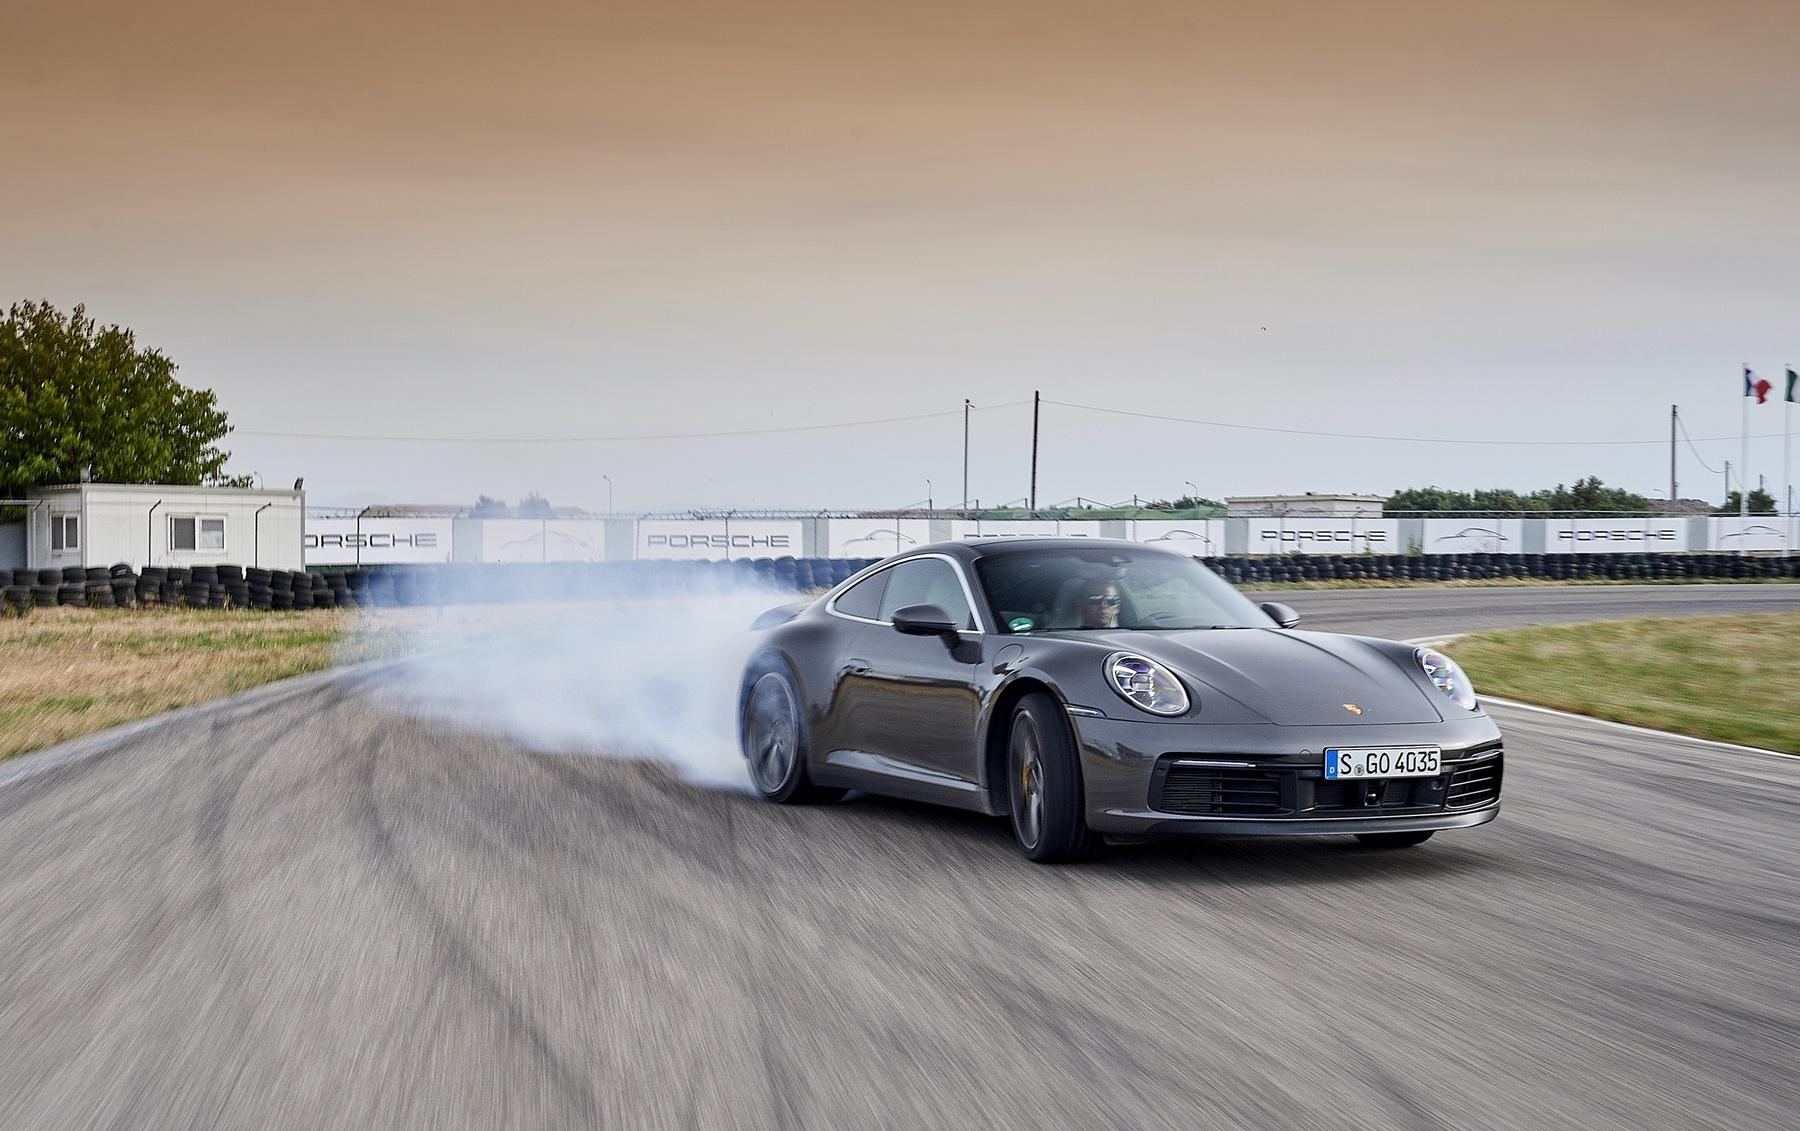 Test_Drive_Porsche_911_Athens_0205